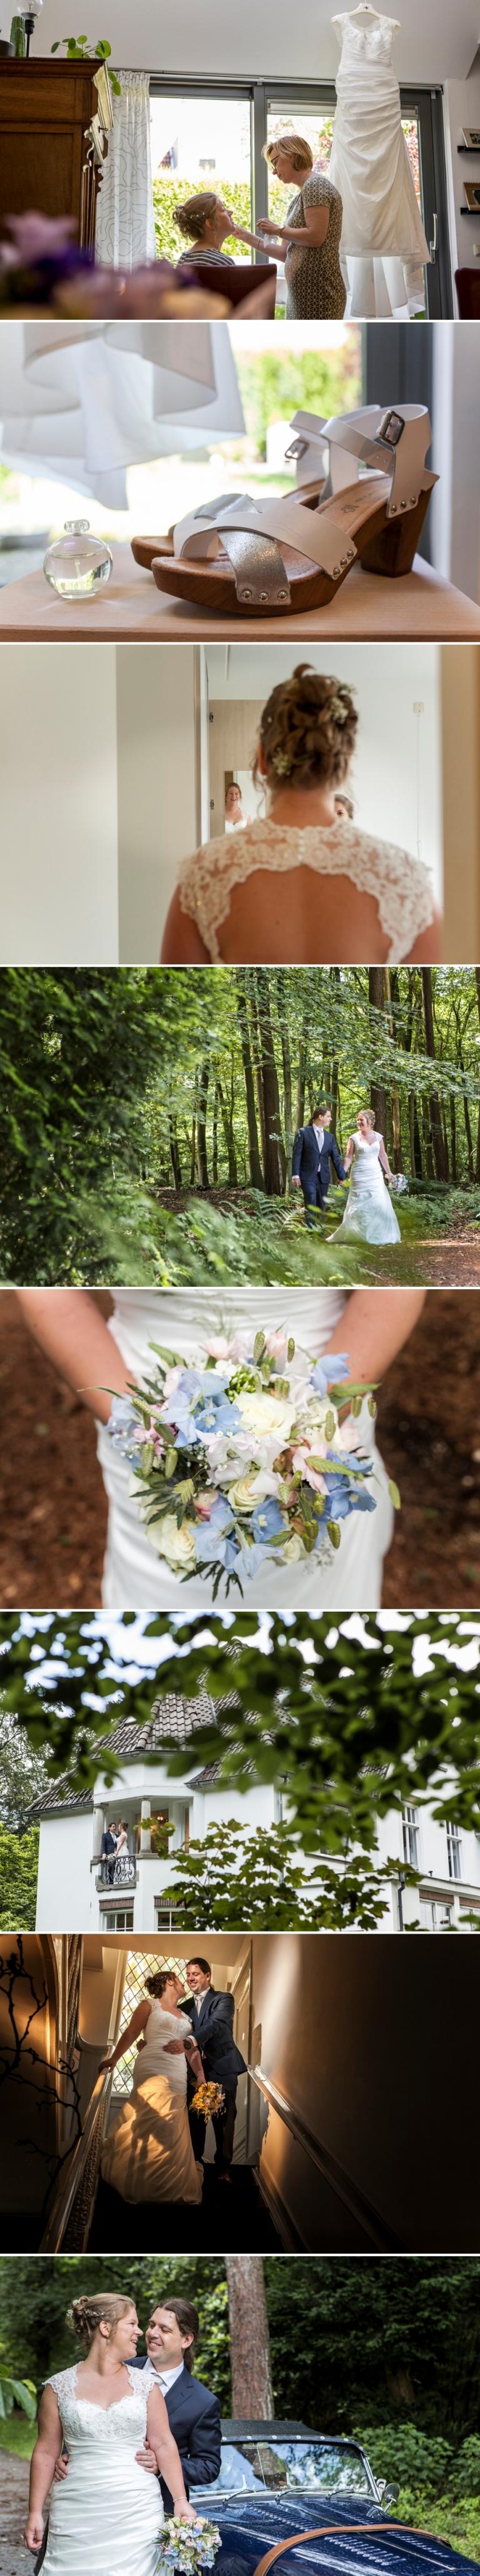 Bruidsfotografie Malden Nijmegen Mook